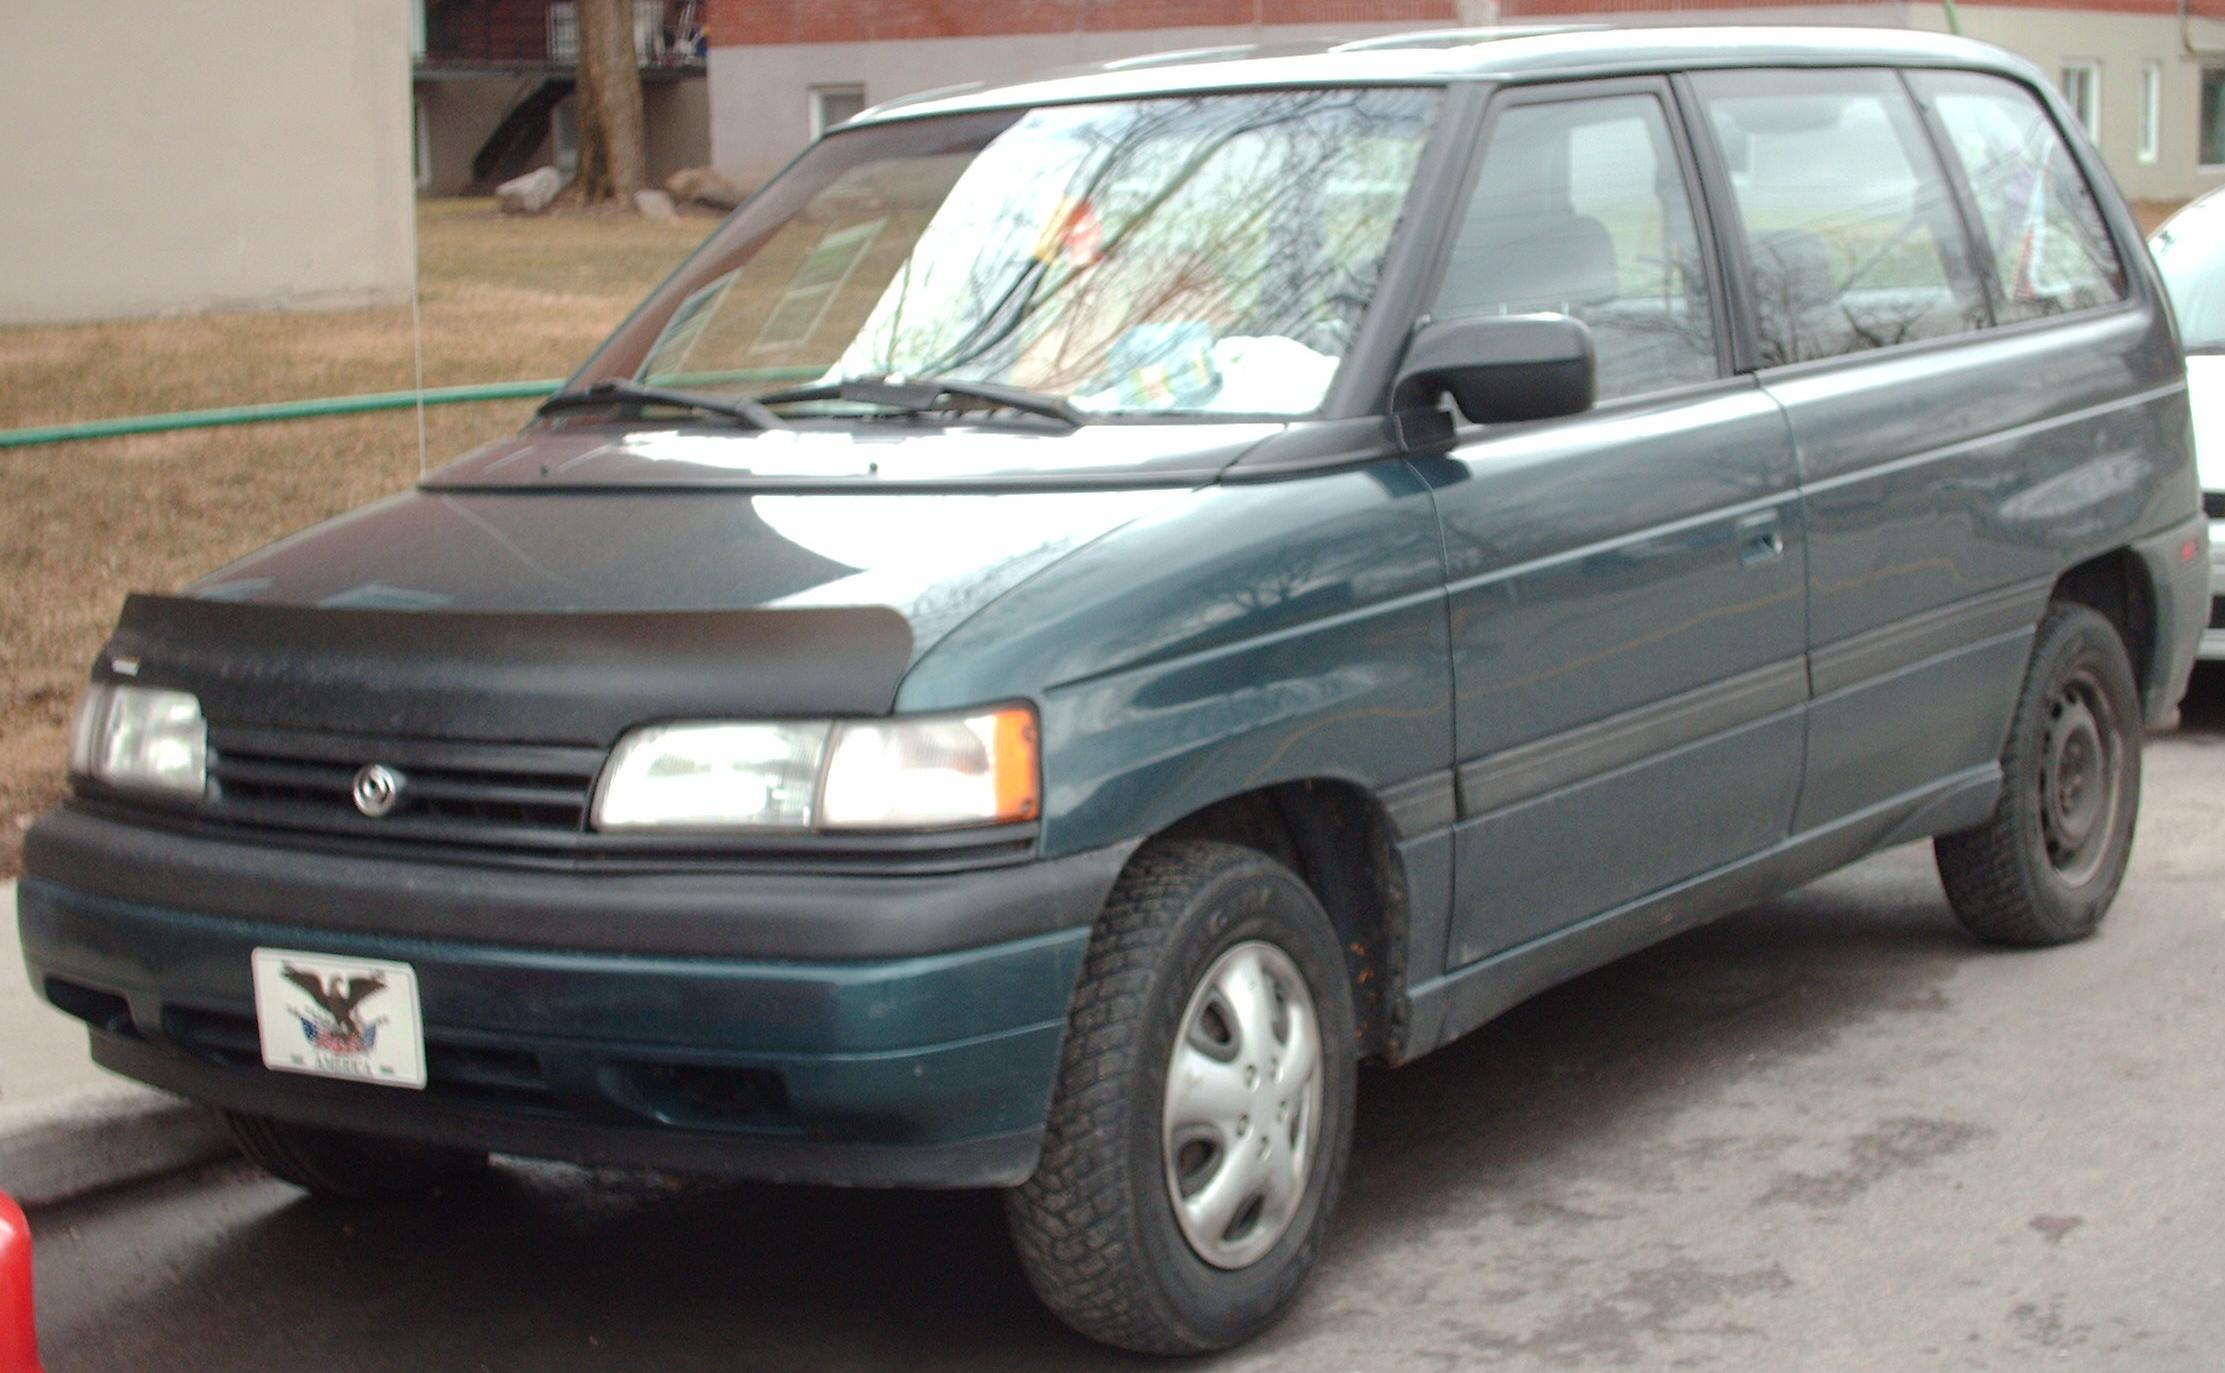 1993 Mazda MPV - Information and photos - ZombieDrive